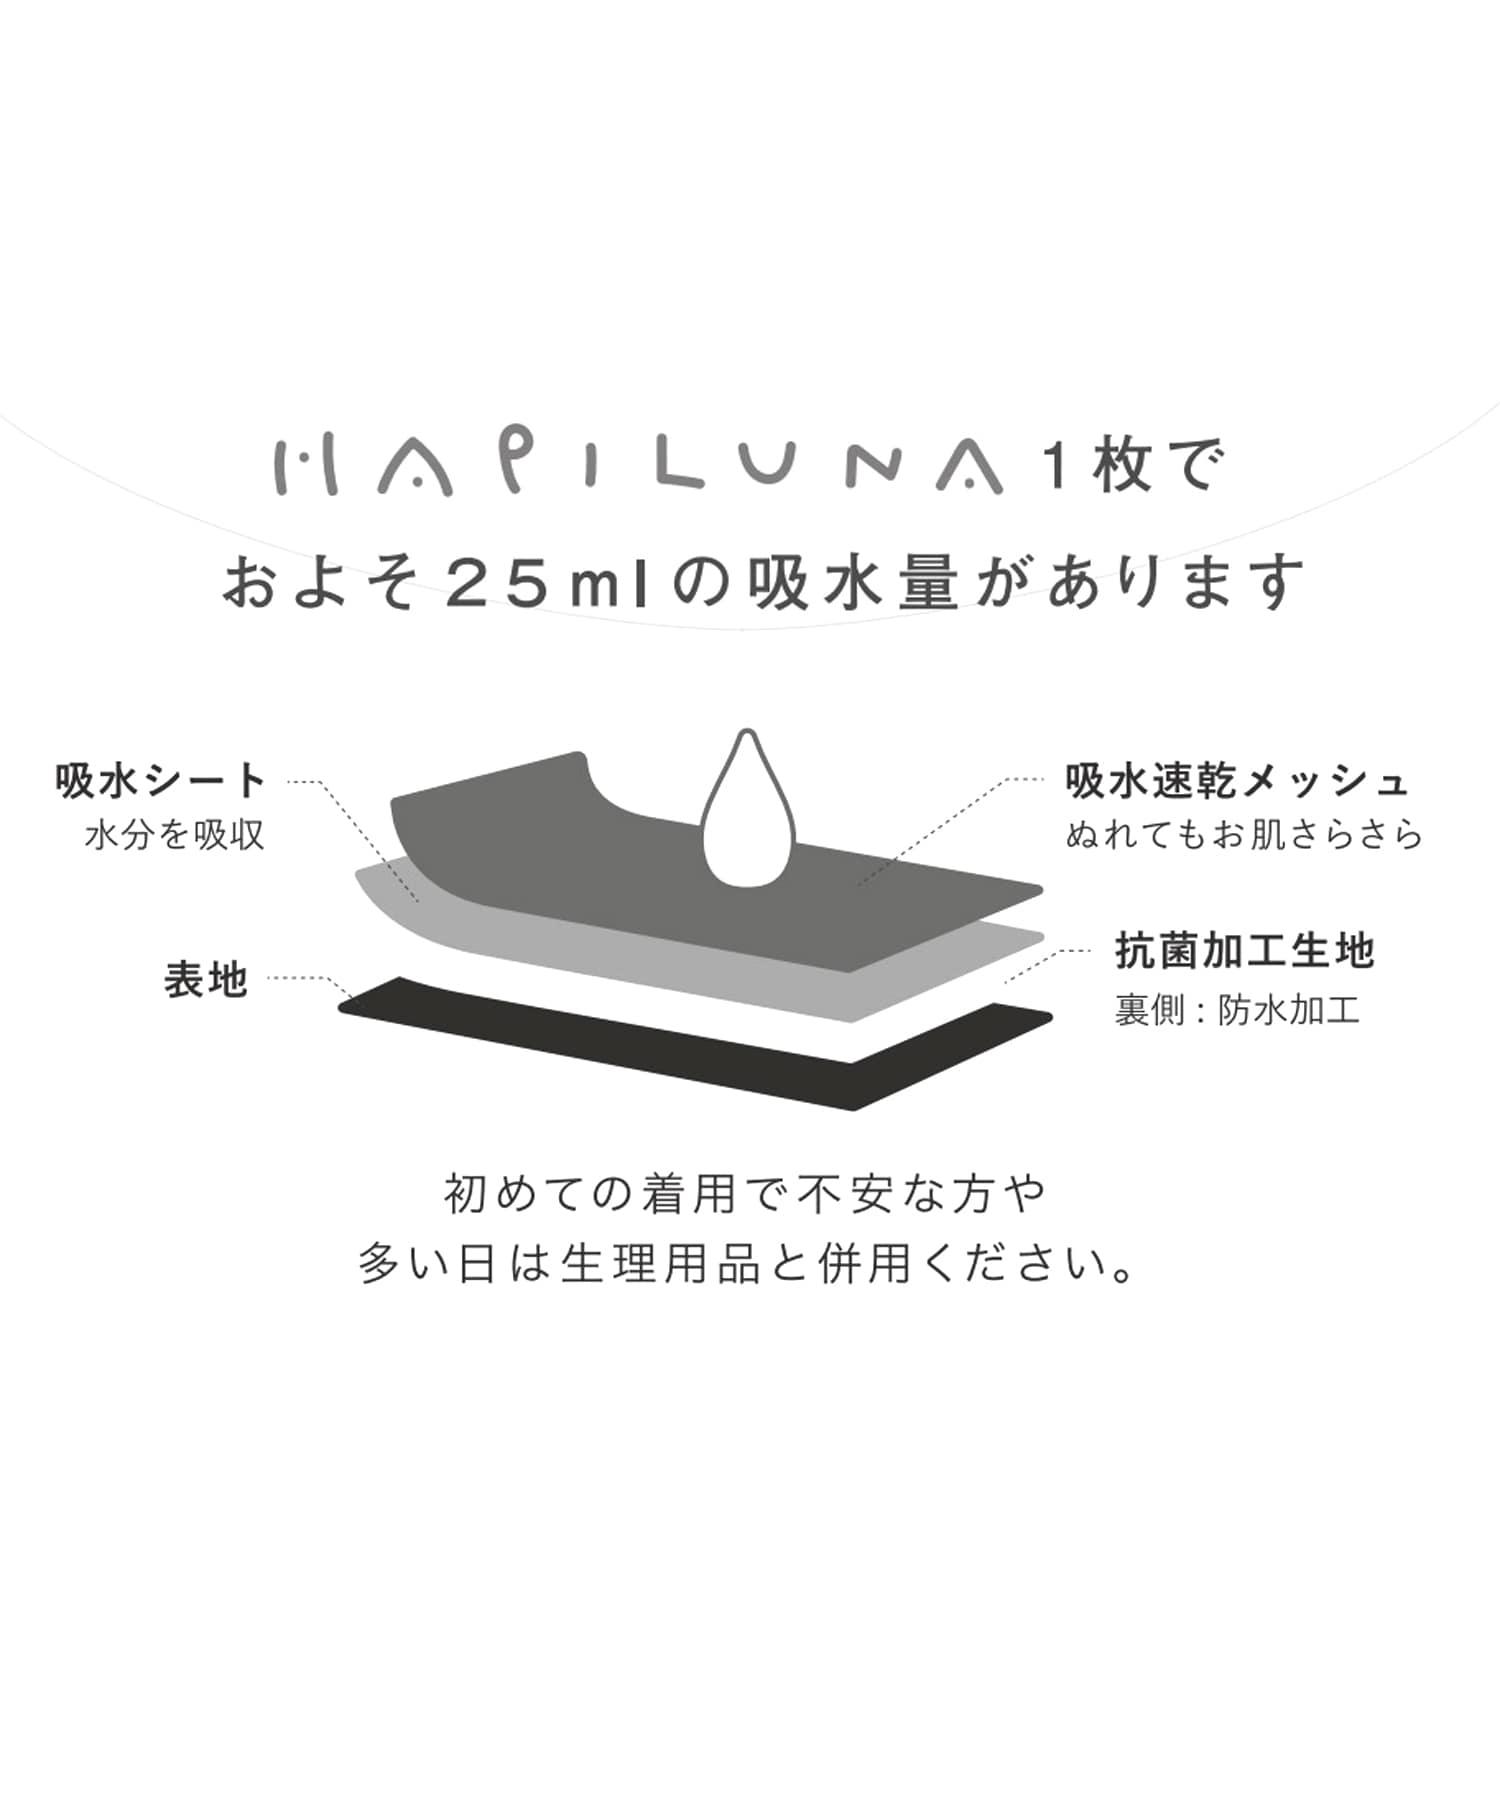 3COINS(スリーコインズ) 【HAPILUNA】サニタリーショーツ:Mサイズ